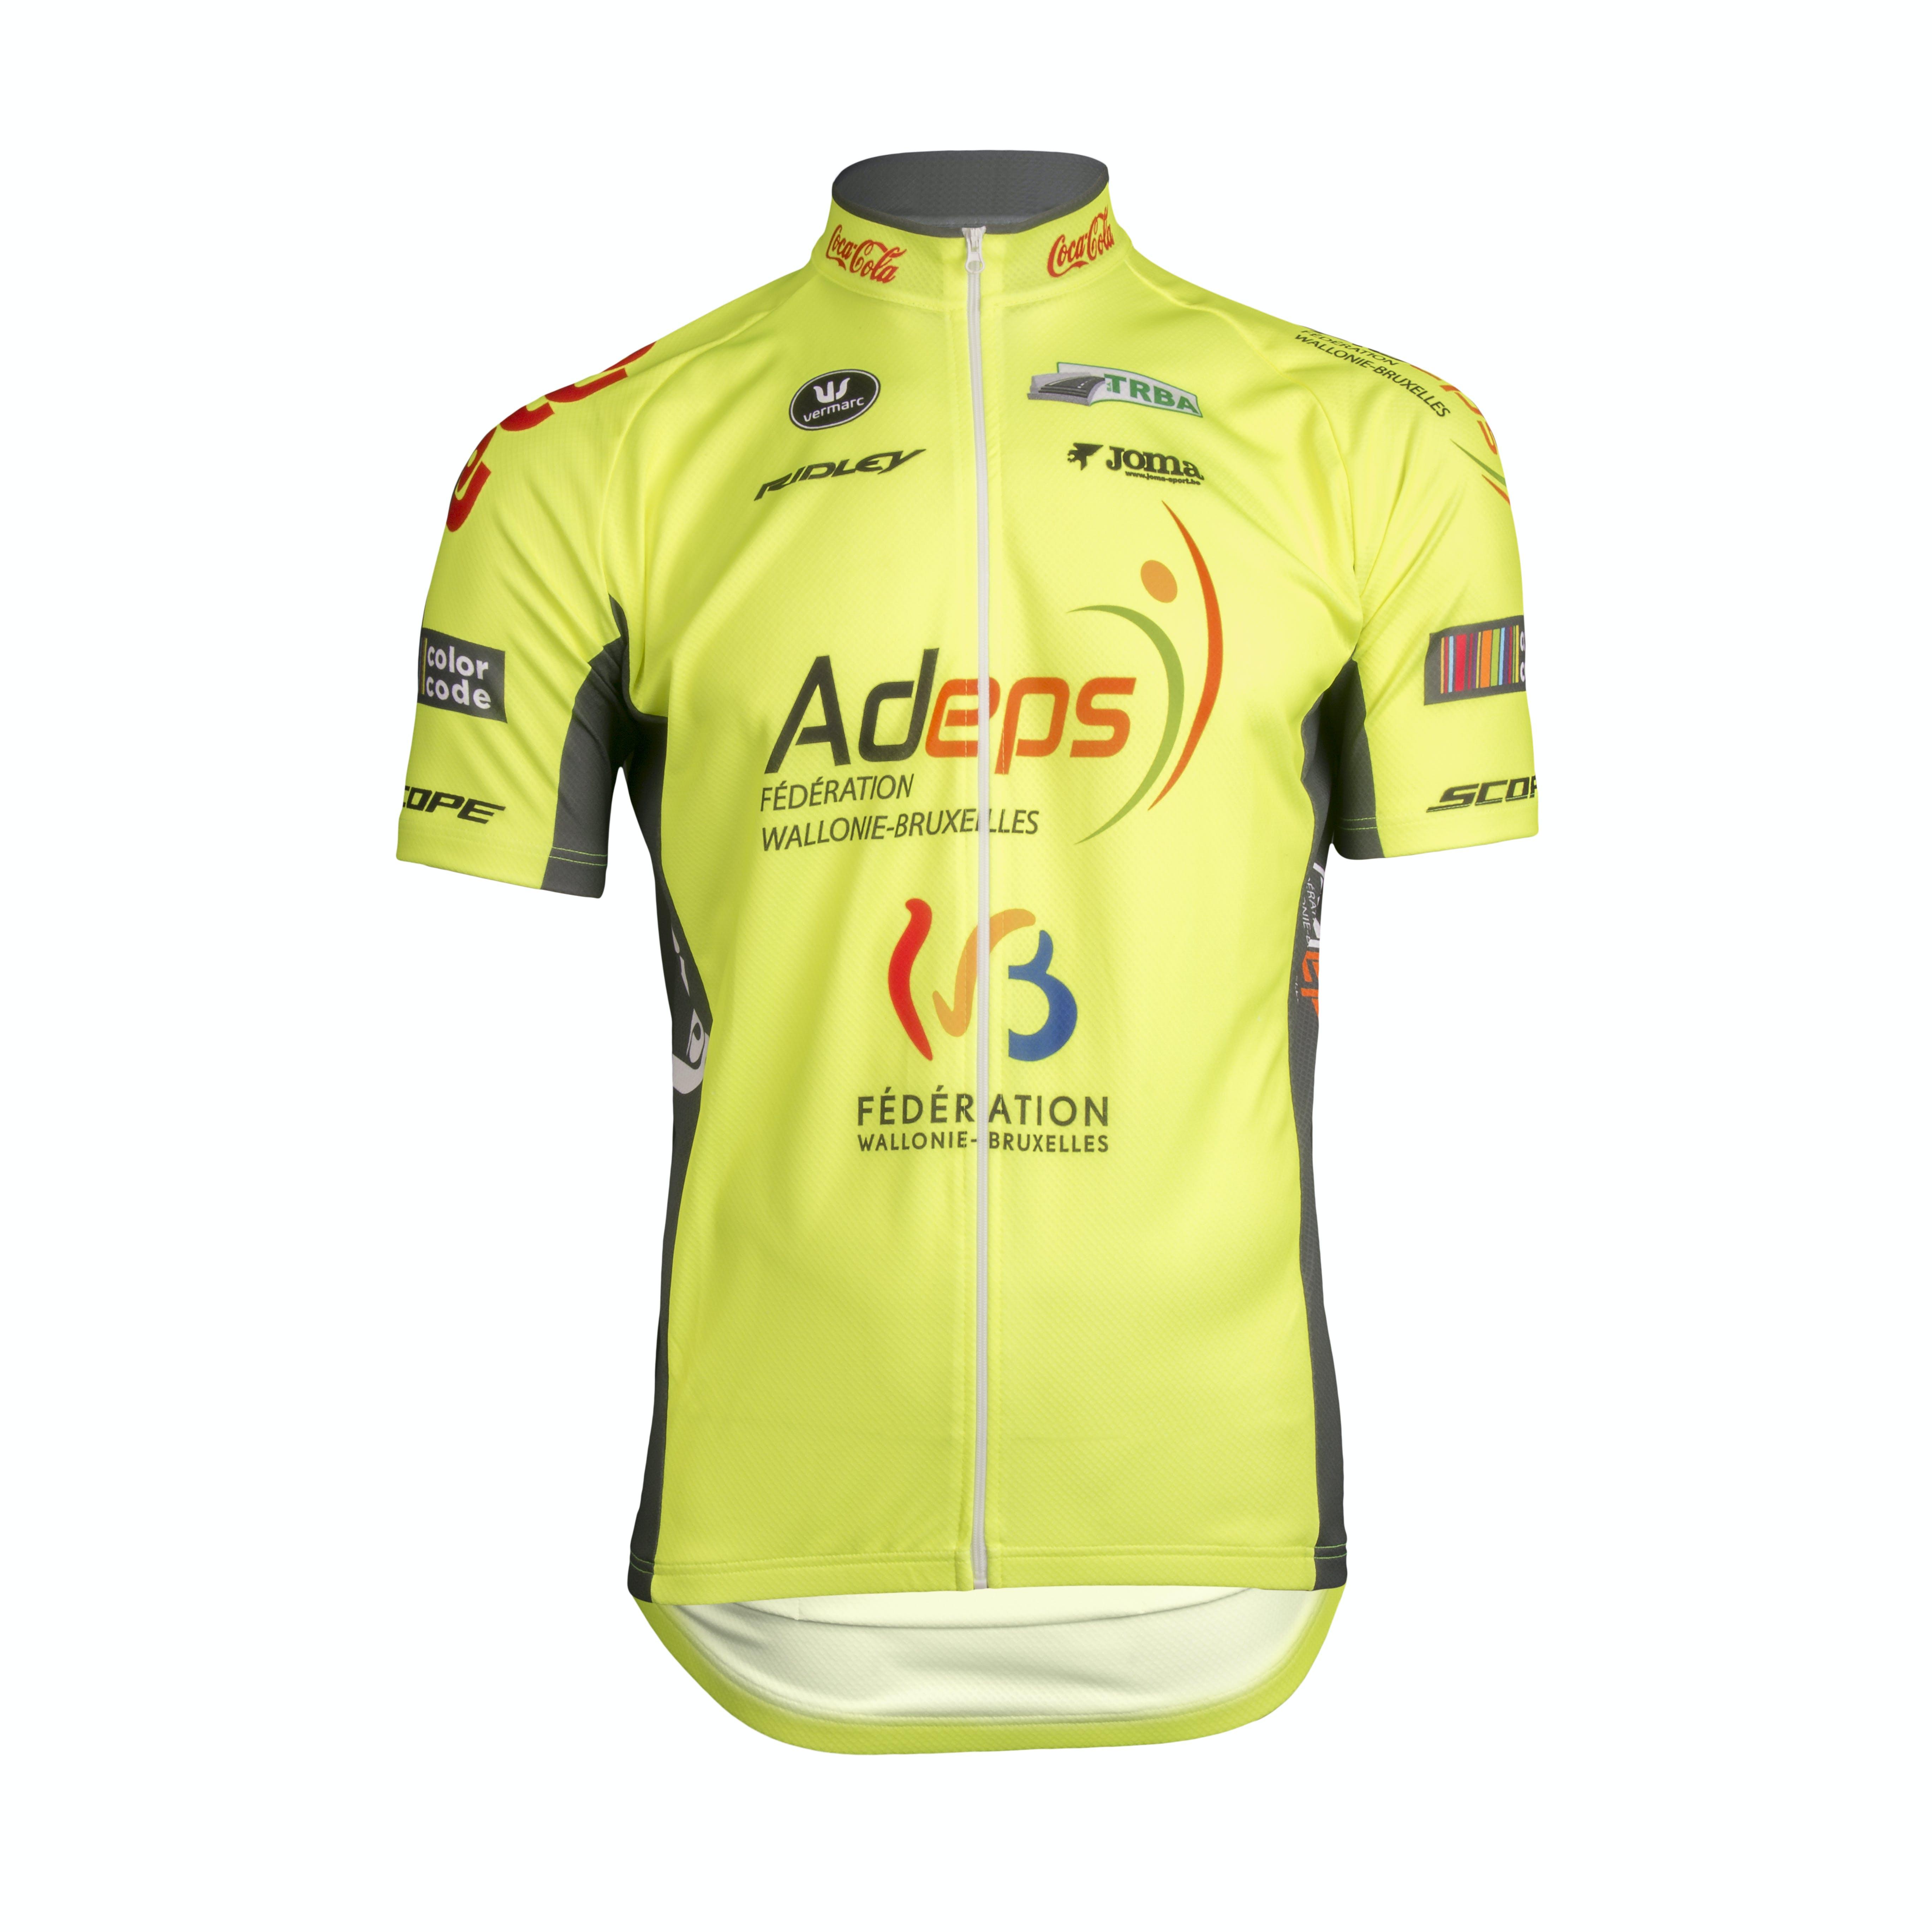 Wallonie Bruxelles 2019 Jersey Short Sleeves Aero